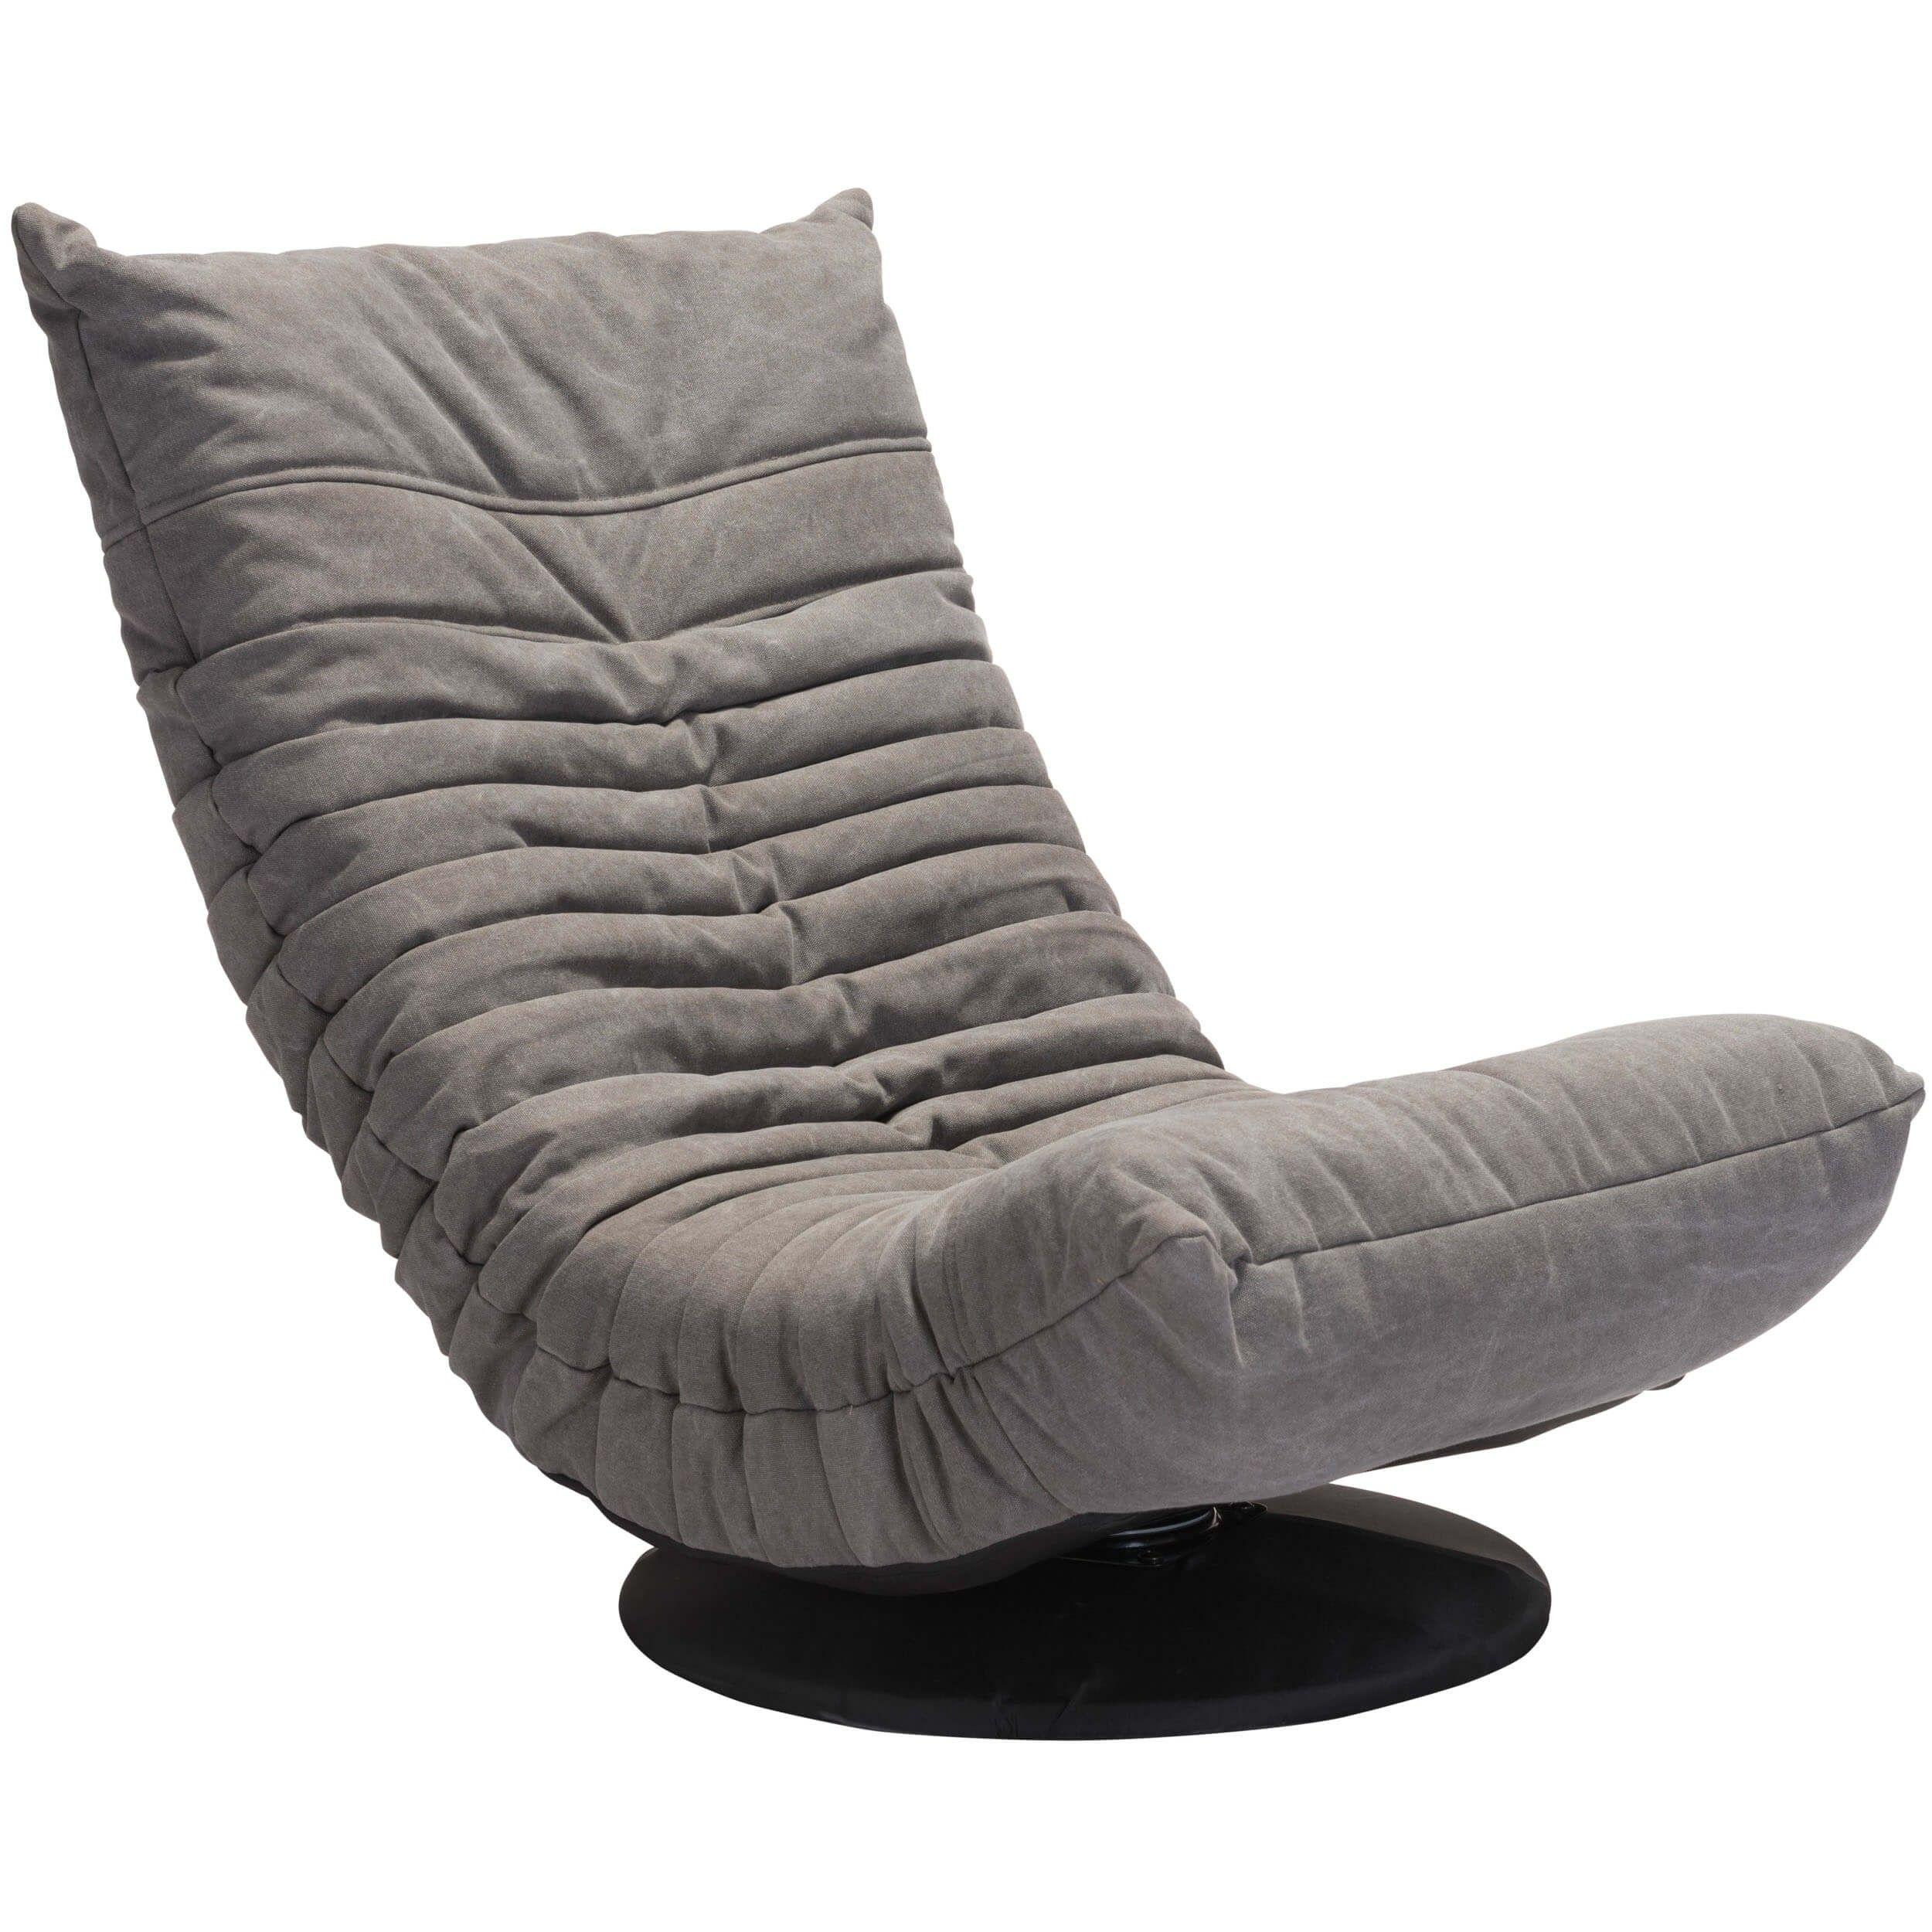 Swell Down Low Swivel Chair Gray Media Room Modern Swivel Uwap Interior Chair Design Uwaporg